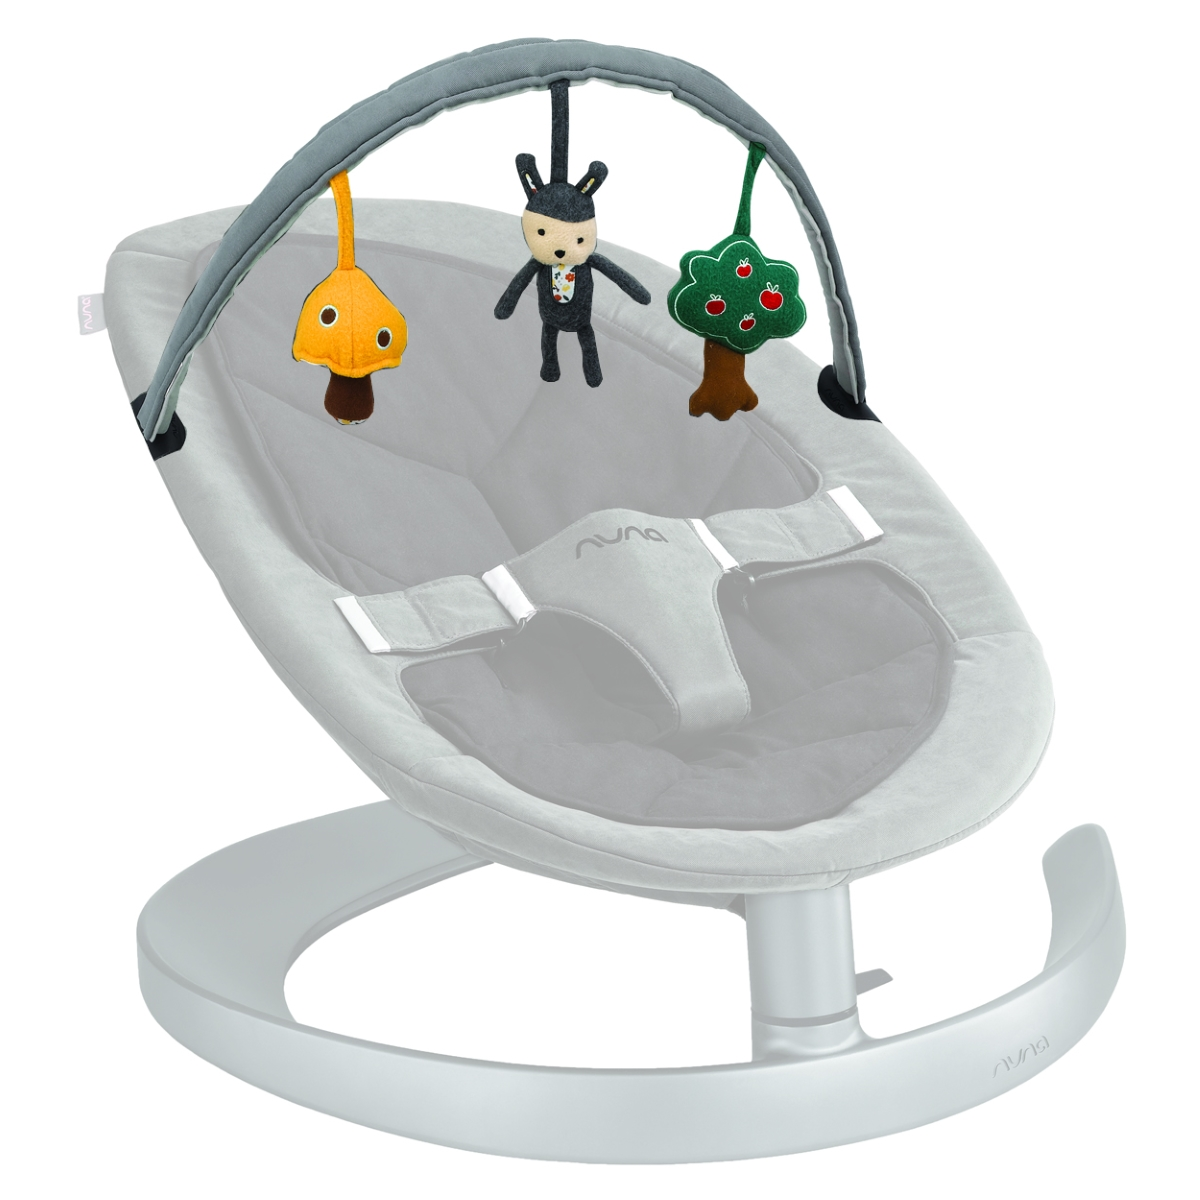 Arco de brinquedos Nuna Leaf Toy Bar